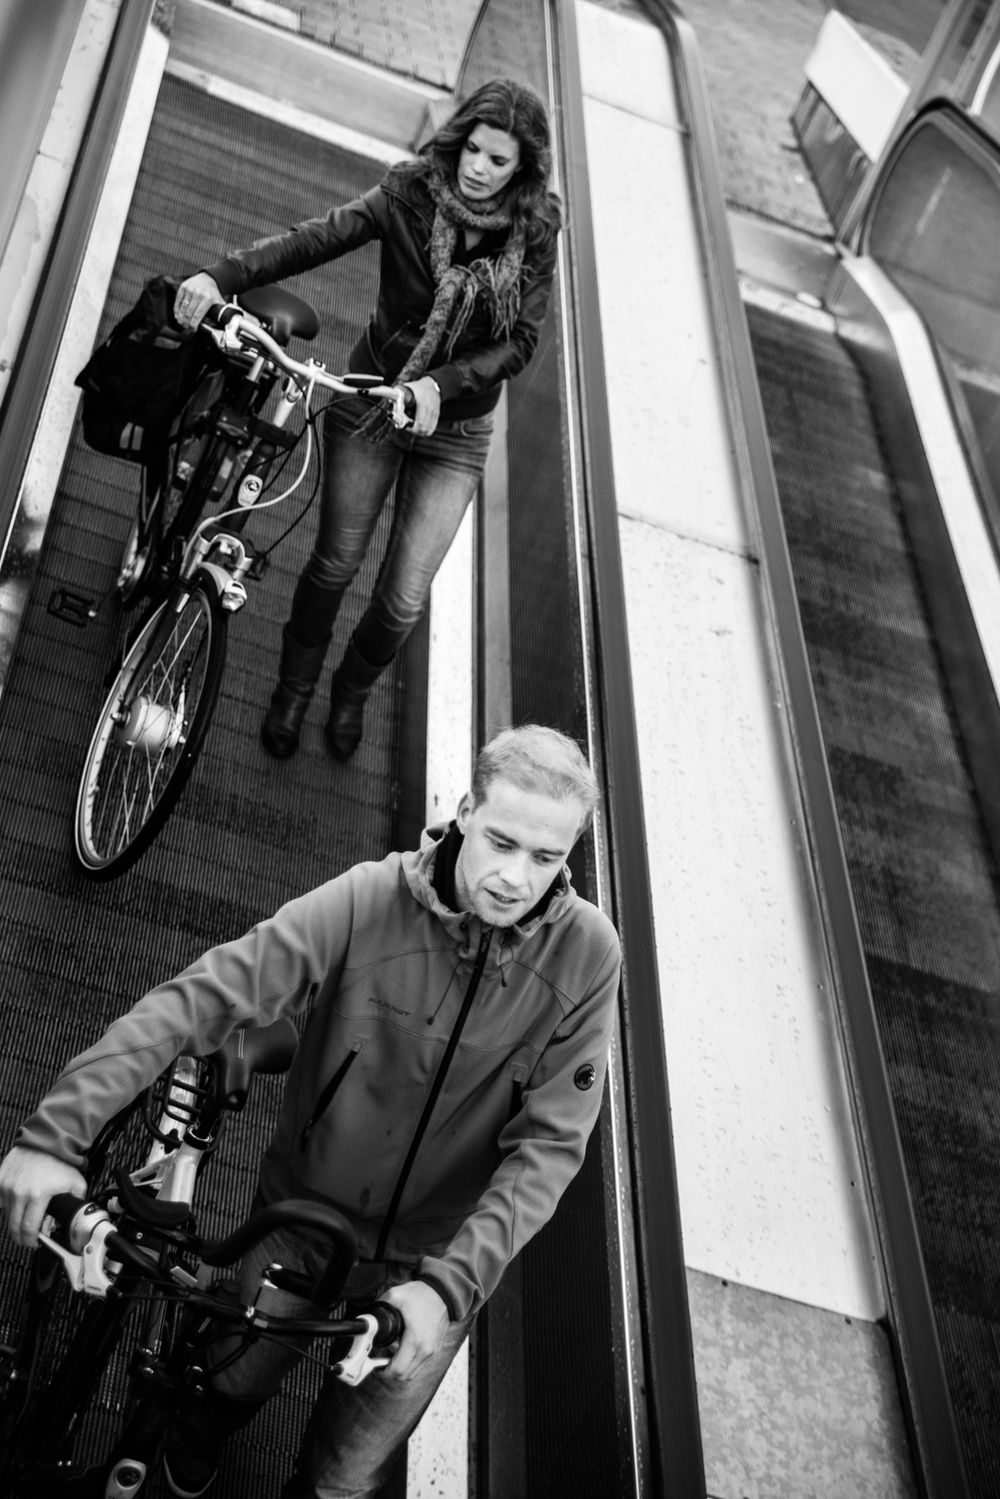 fotowalk_tilburg-58.jpg